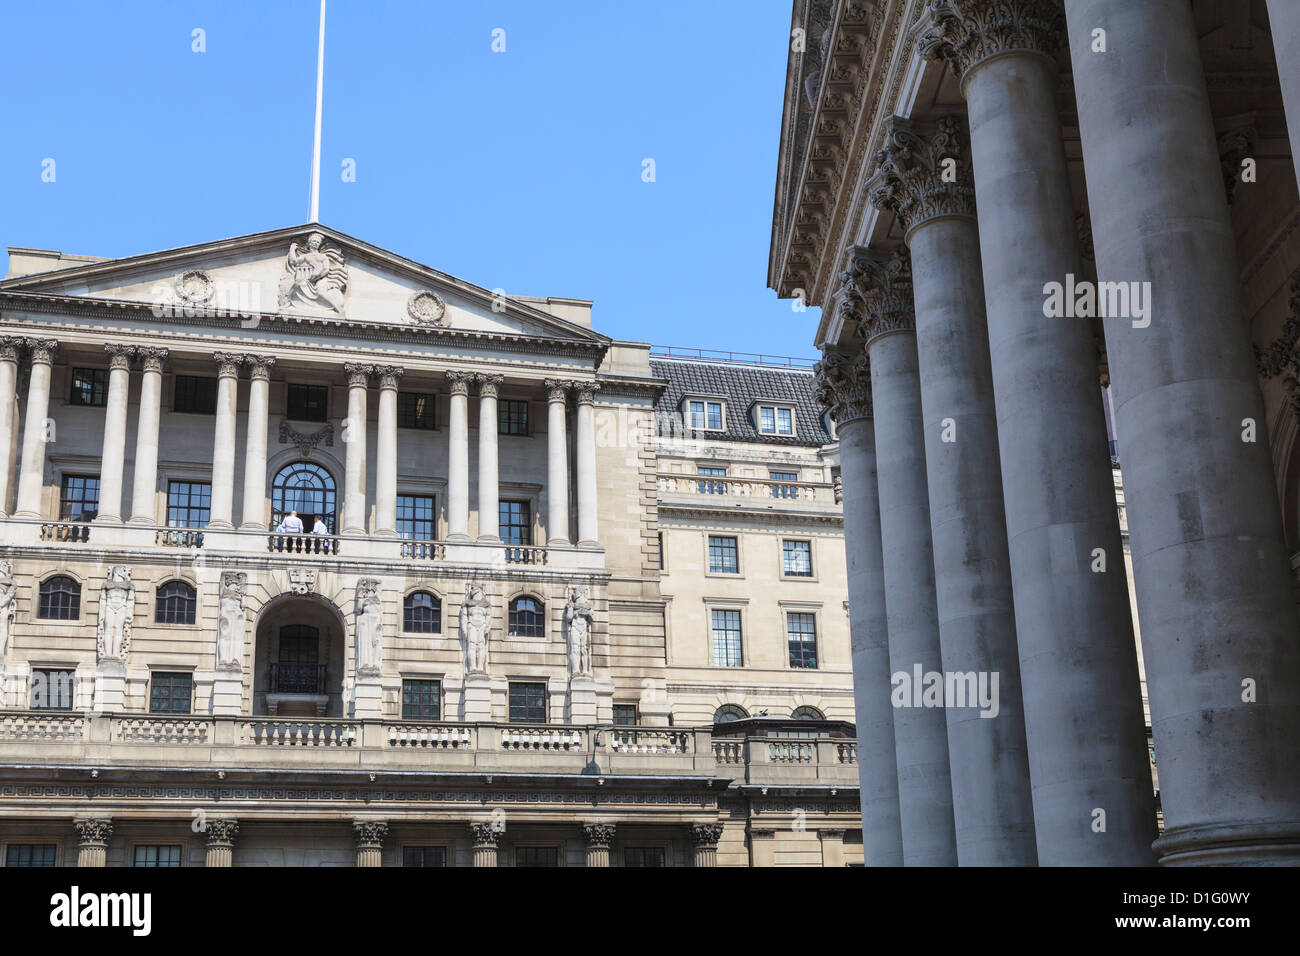 The Bank of England and Royal Exchange, Threadneedle Street, City of London, London, England, United Kingdom, Europe - Stock Image